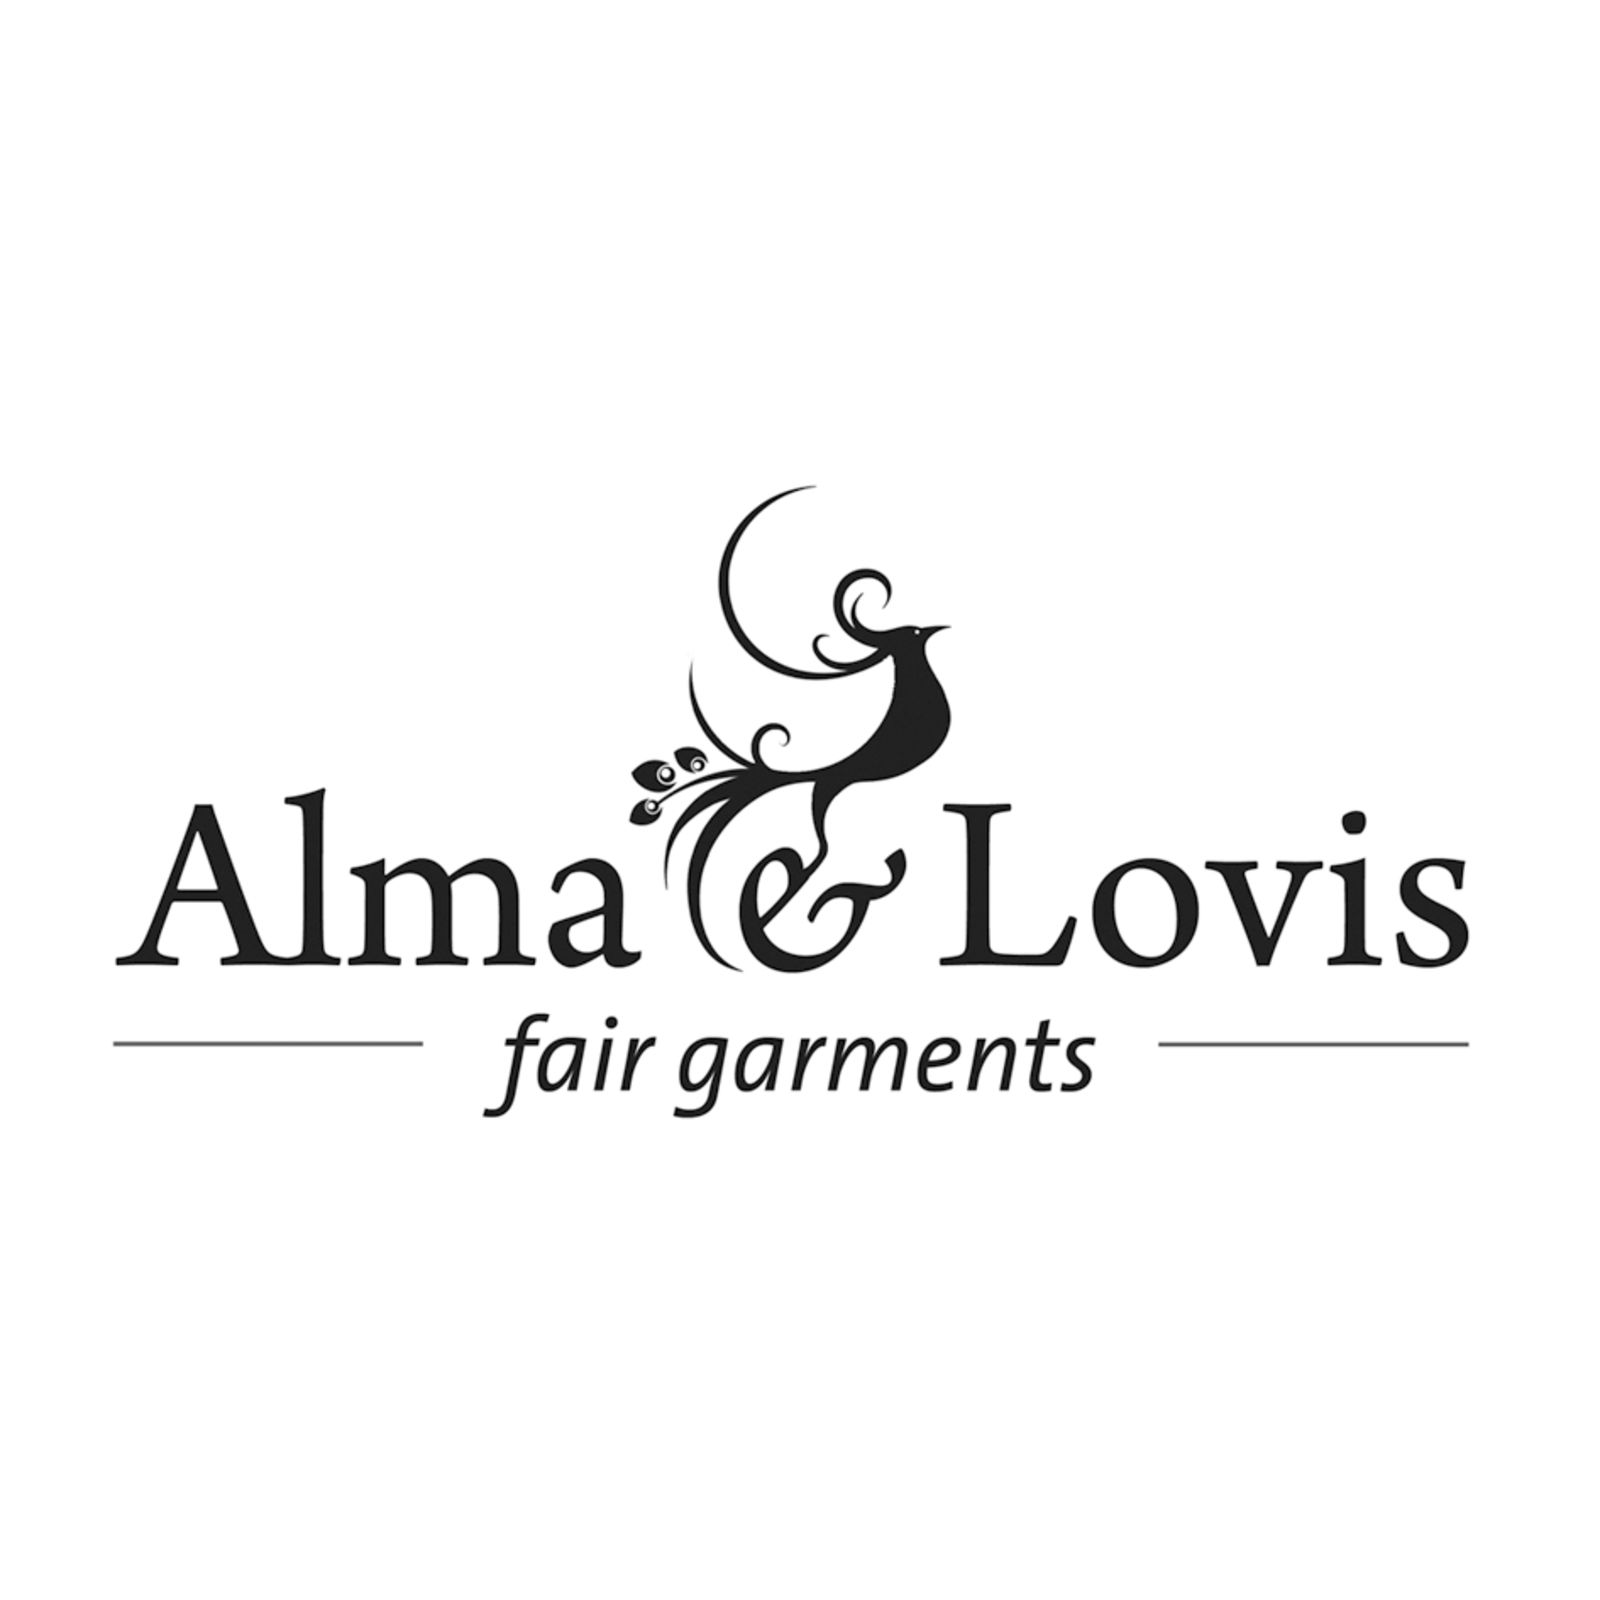 Alma & Lovis (Bild 1)